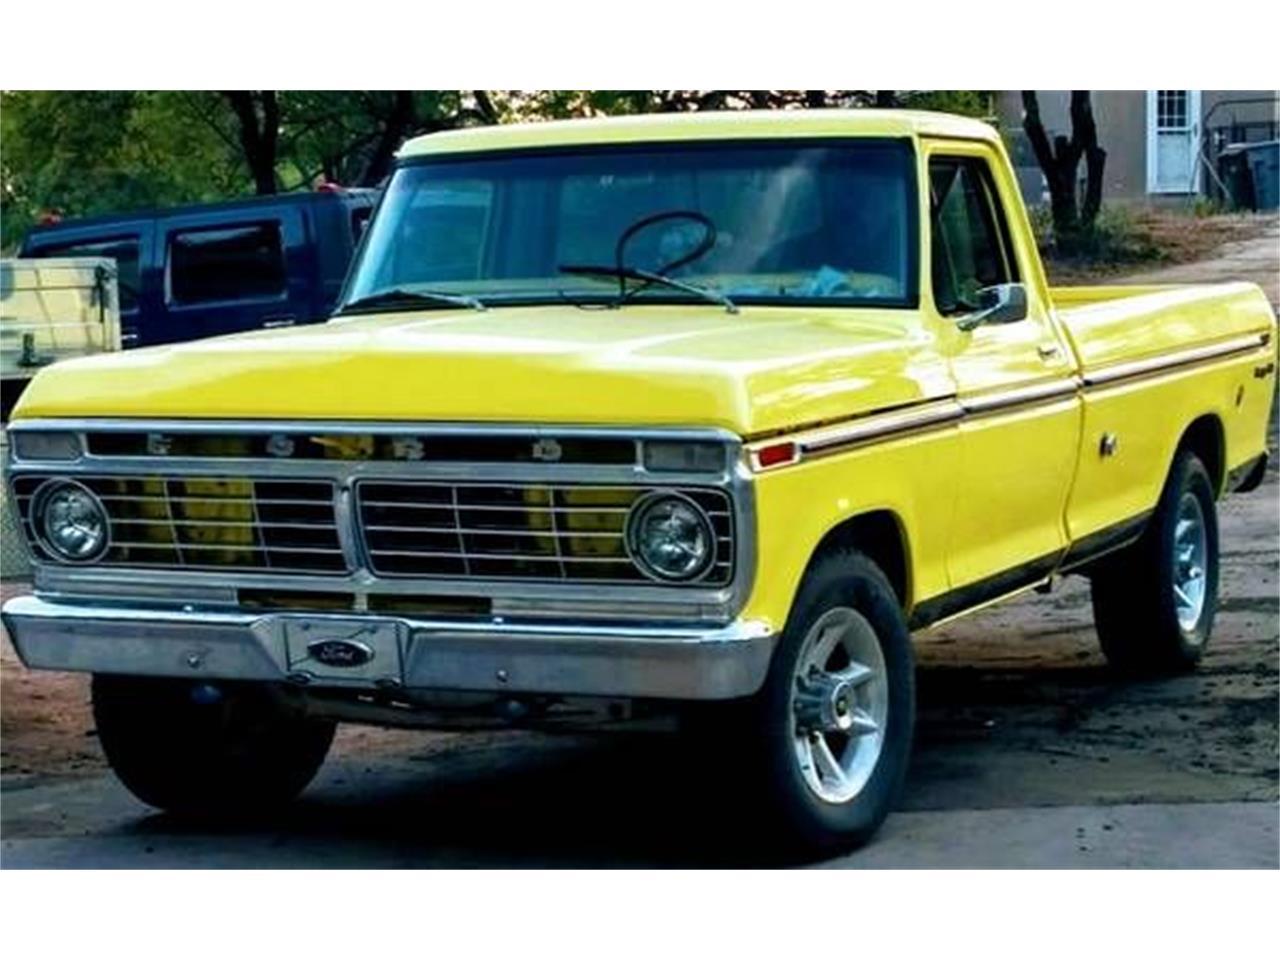 1973 Ford F250 For Sale Classiccars Com Cc 1134538